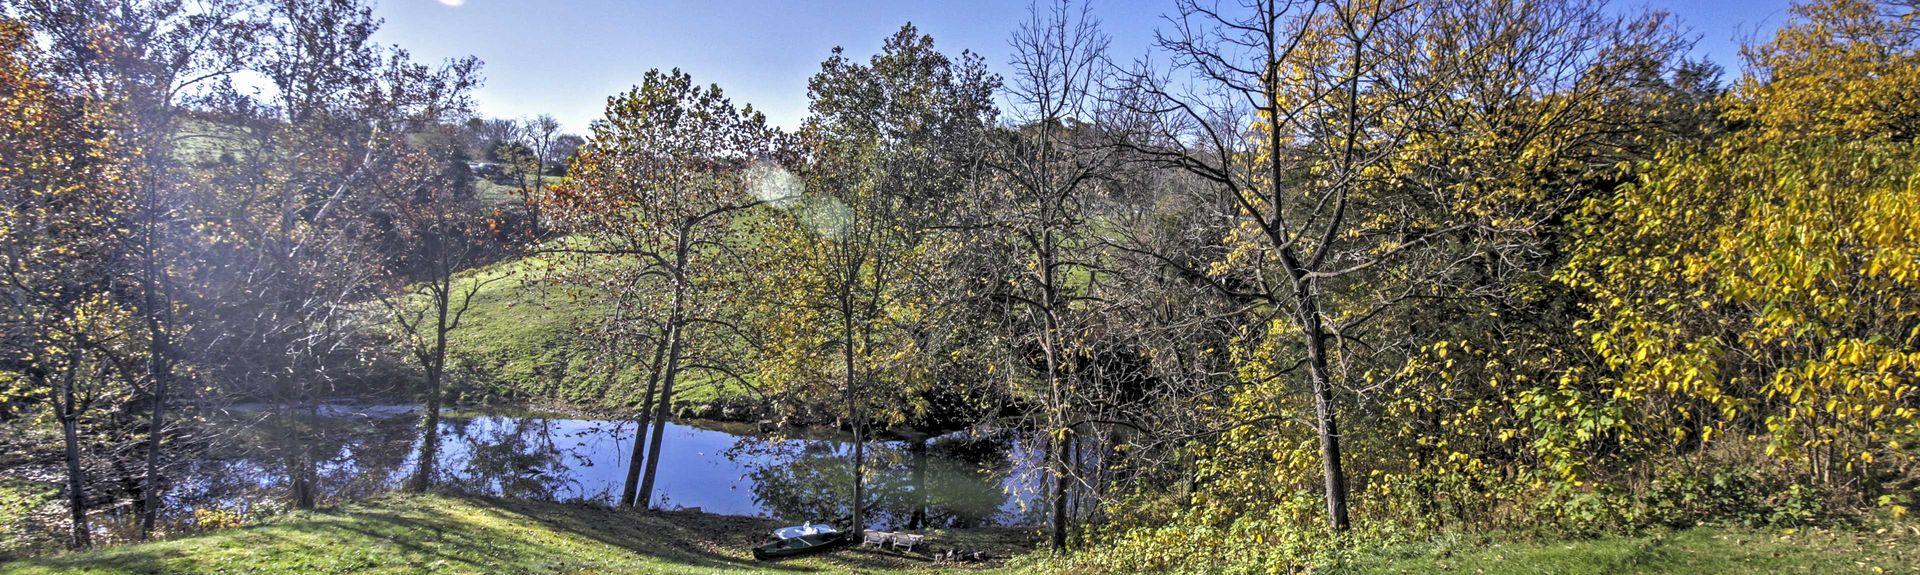 Shenandoah River State Park, Bentonville, VA, USA